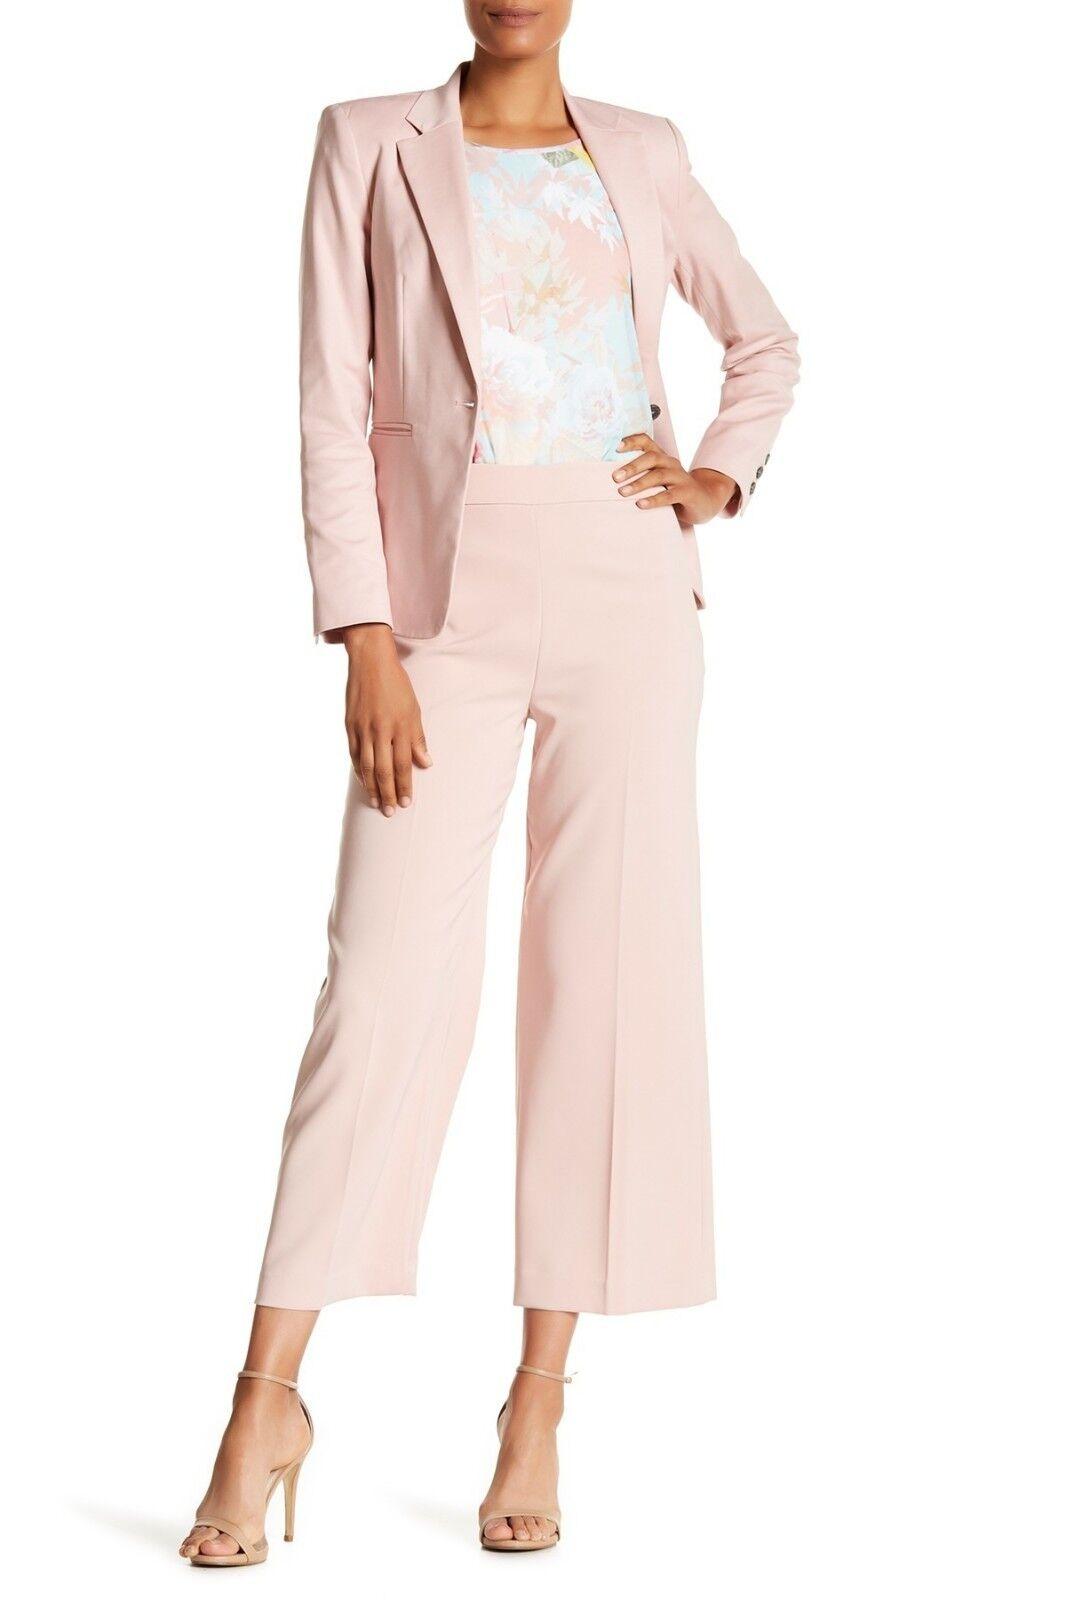 NWT Vince Camuto High-Waist Crop Pants Wild pink Womens sz Petite 10 P Work